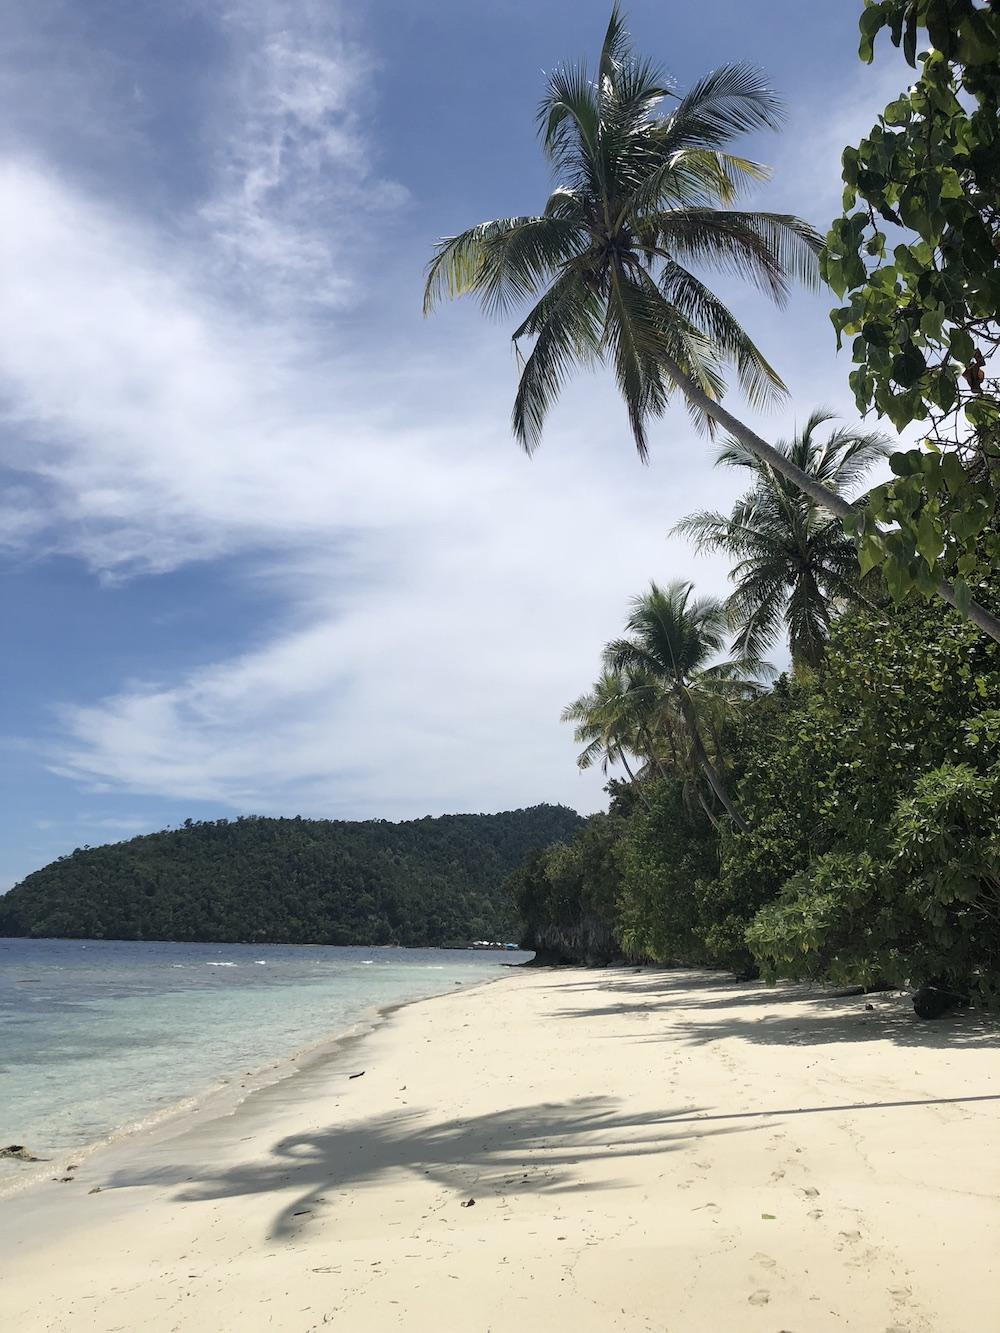 kri-island-beach